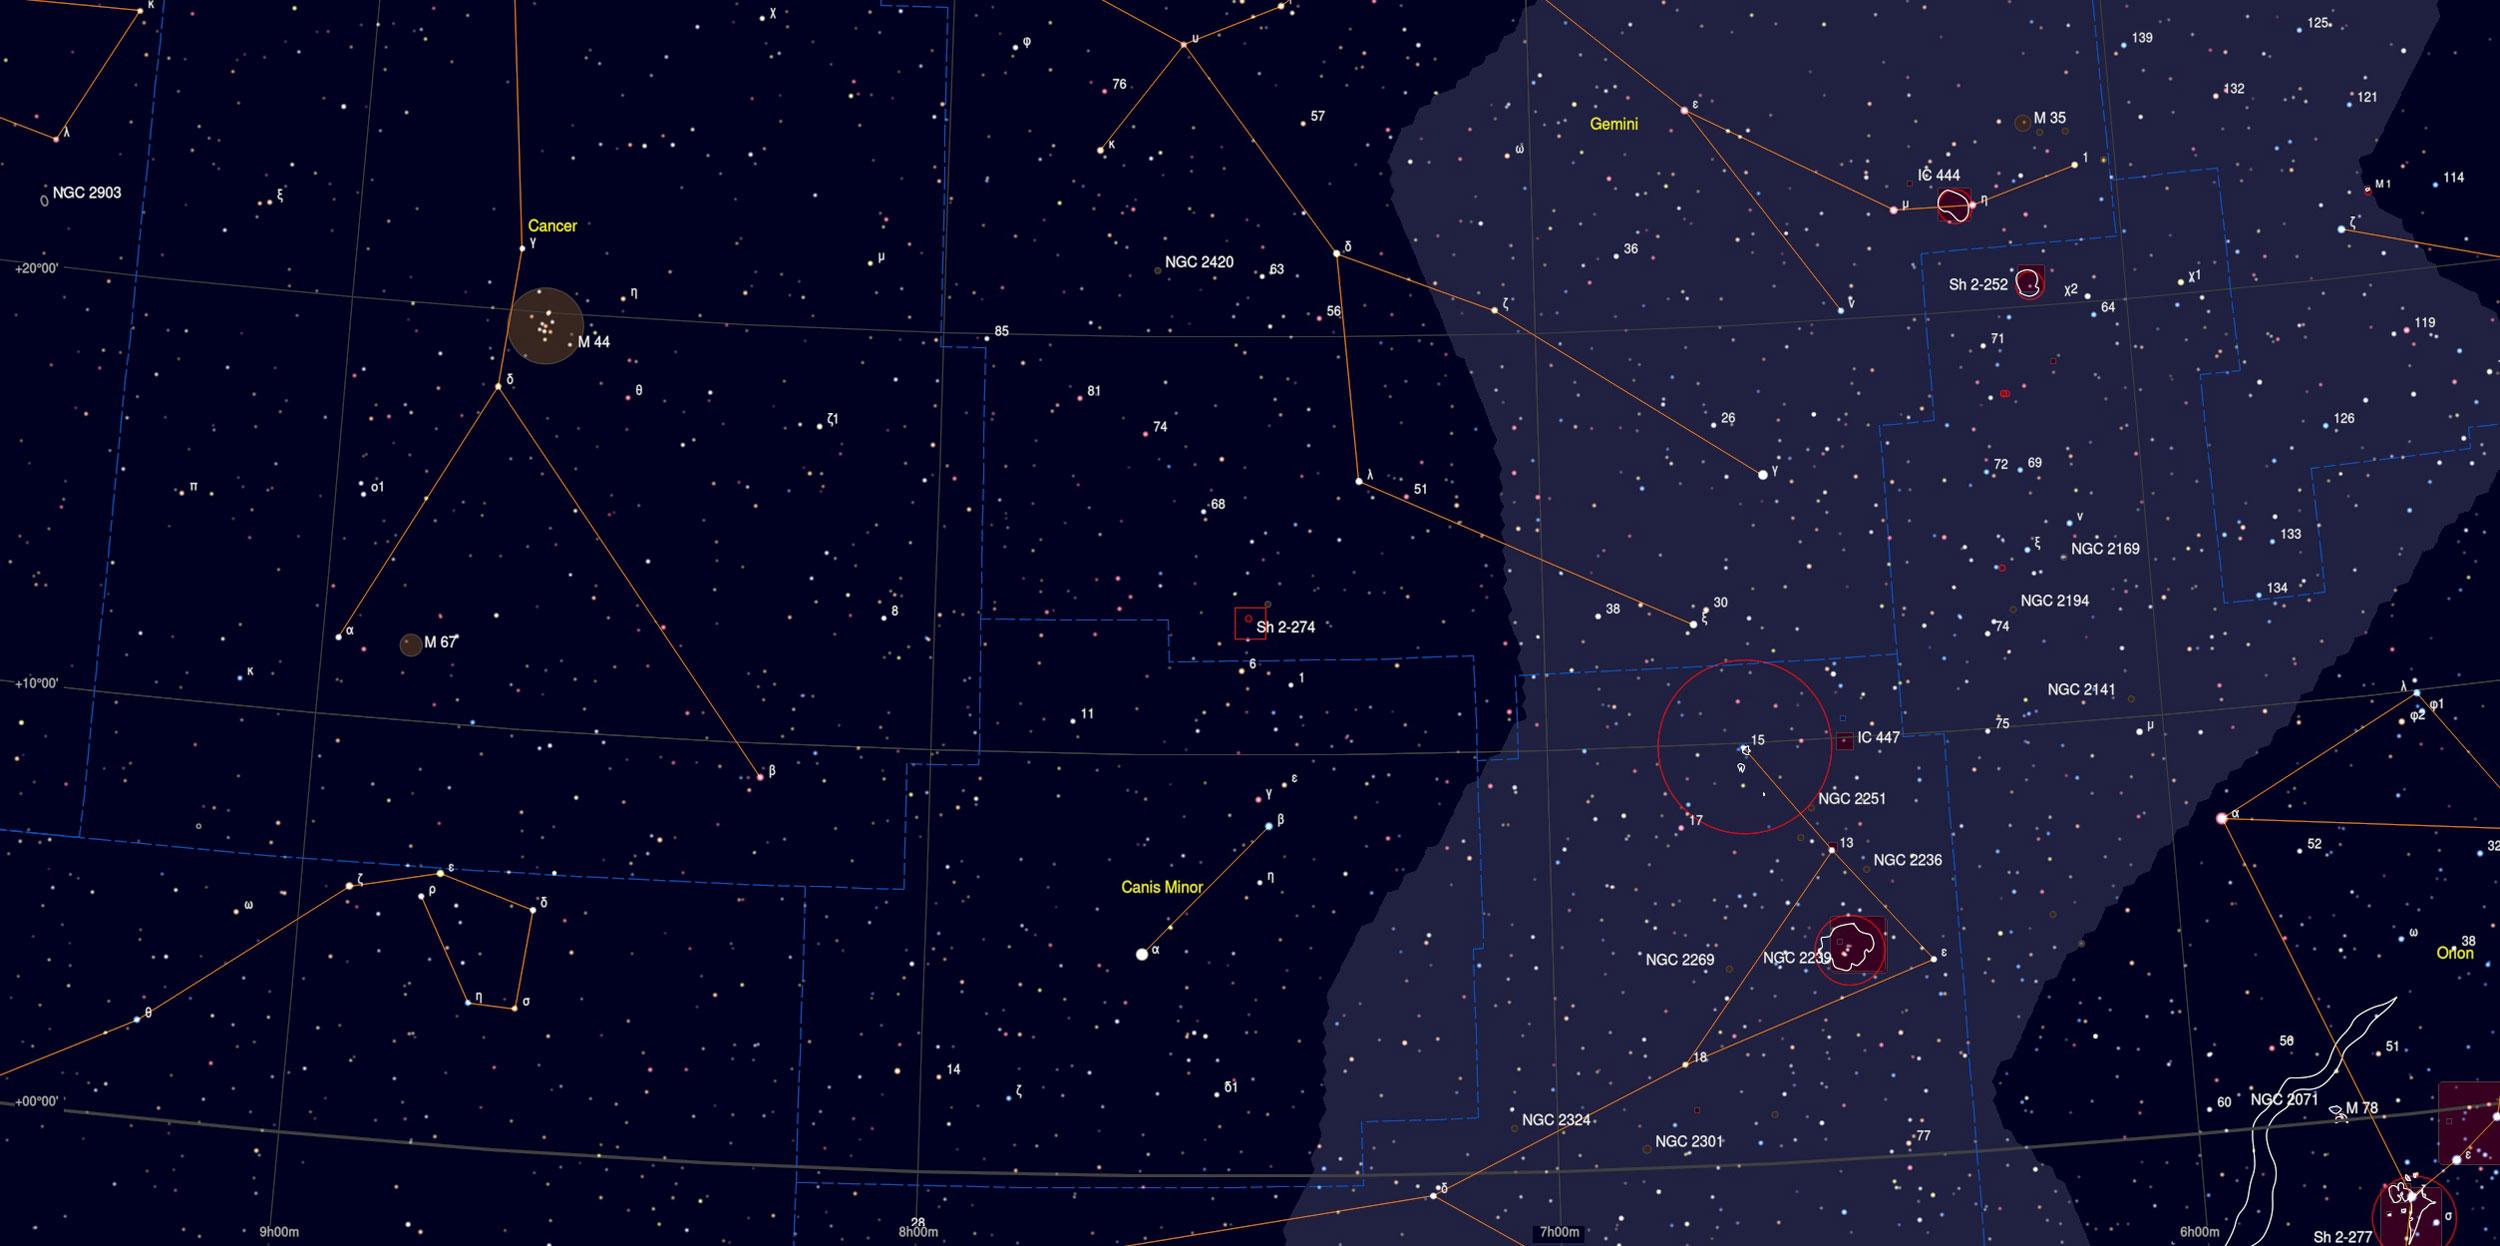 Medusa Nebula Sky Chart - Astrophotography Martin Rusterholz